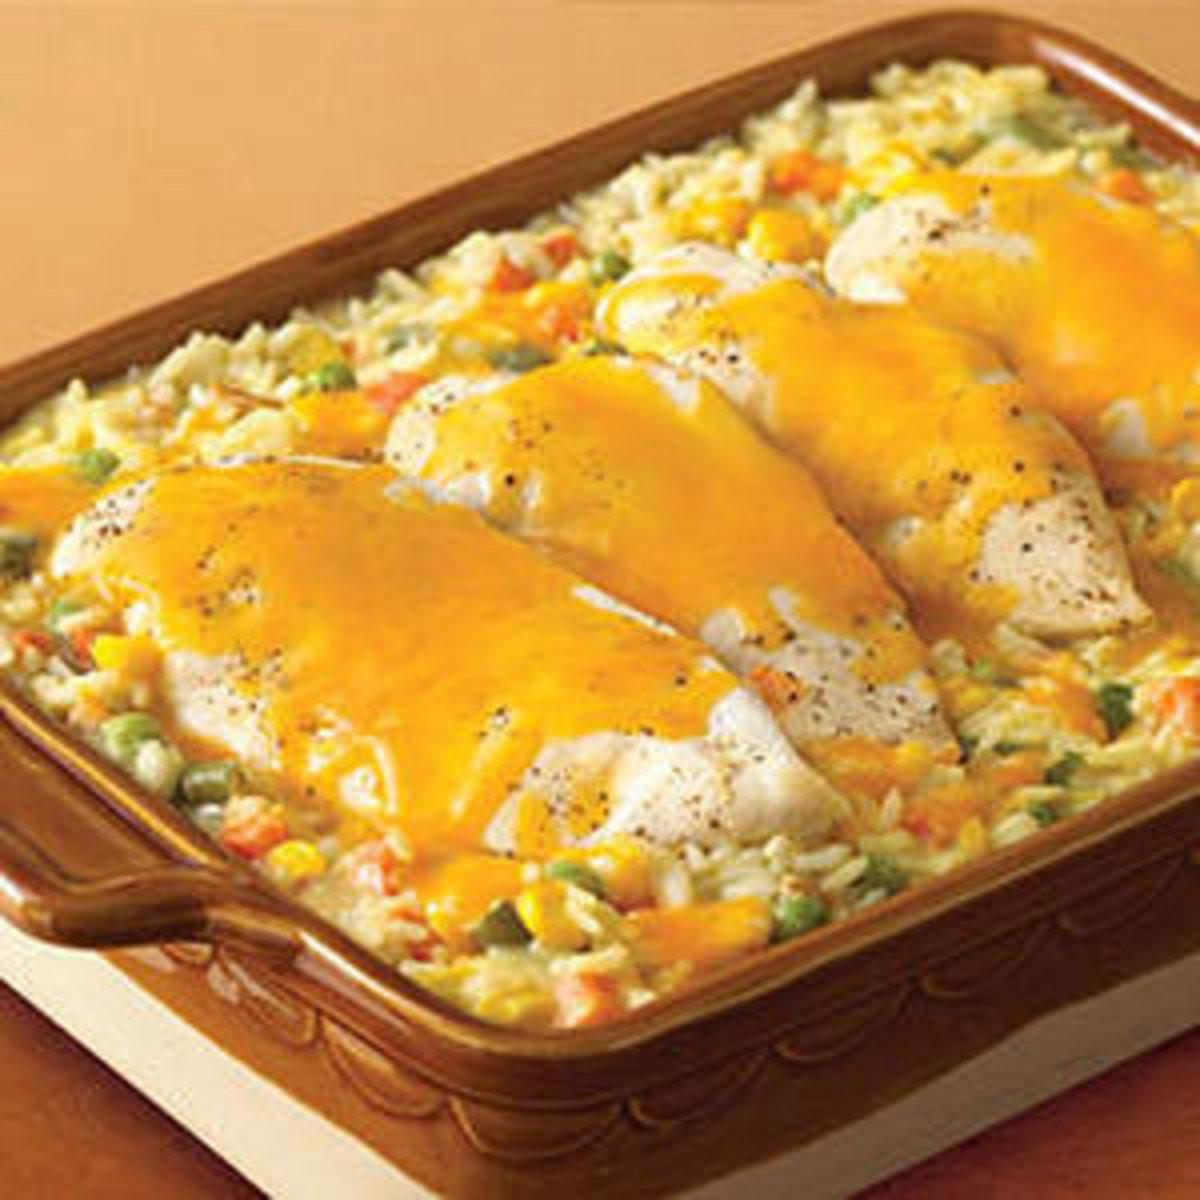 Cheesy Chicken And Rice Casserole  Cheesy Chicken & Rice Casserole Rachael Ray Every Day